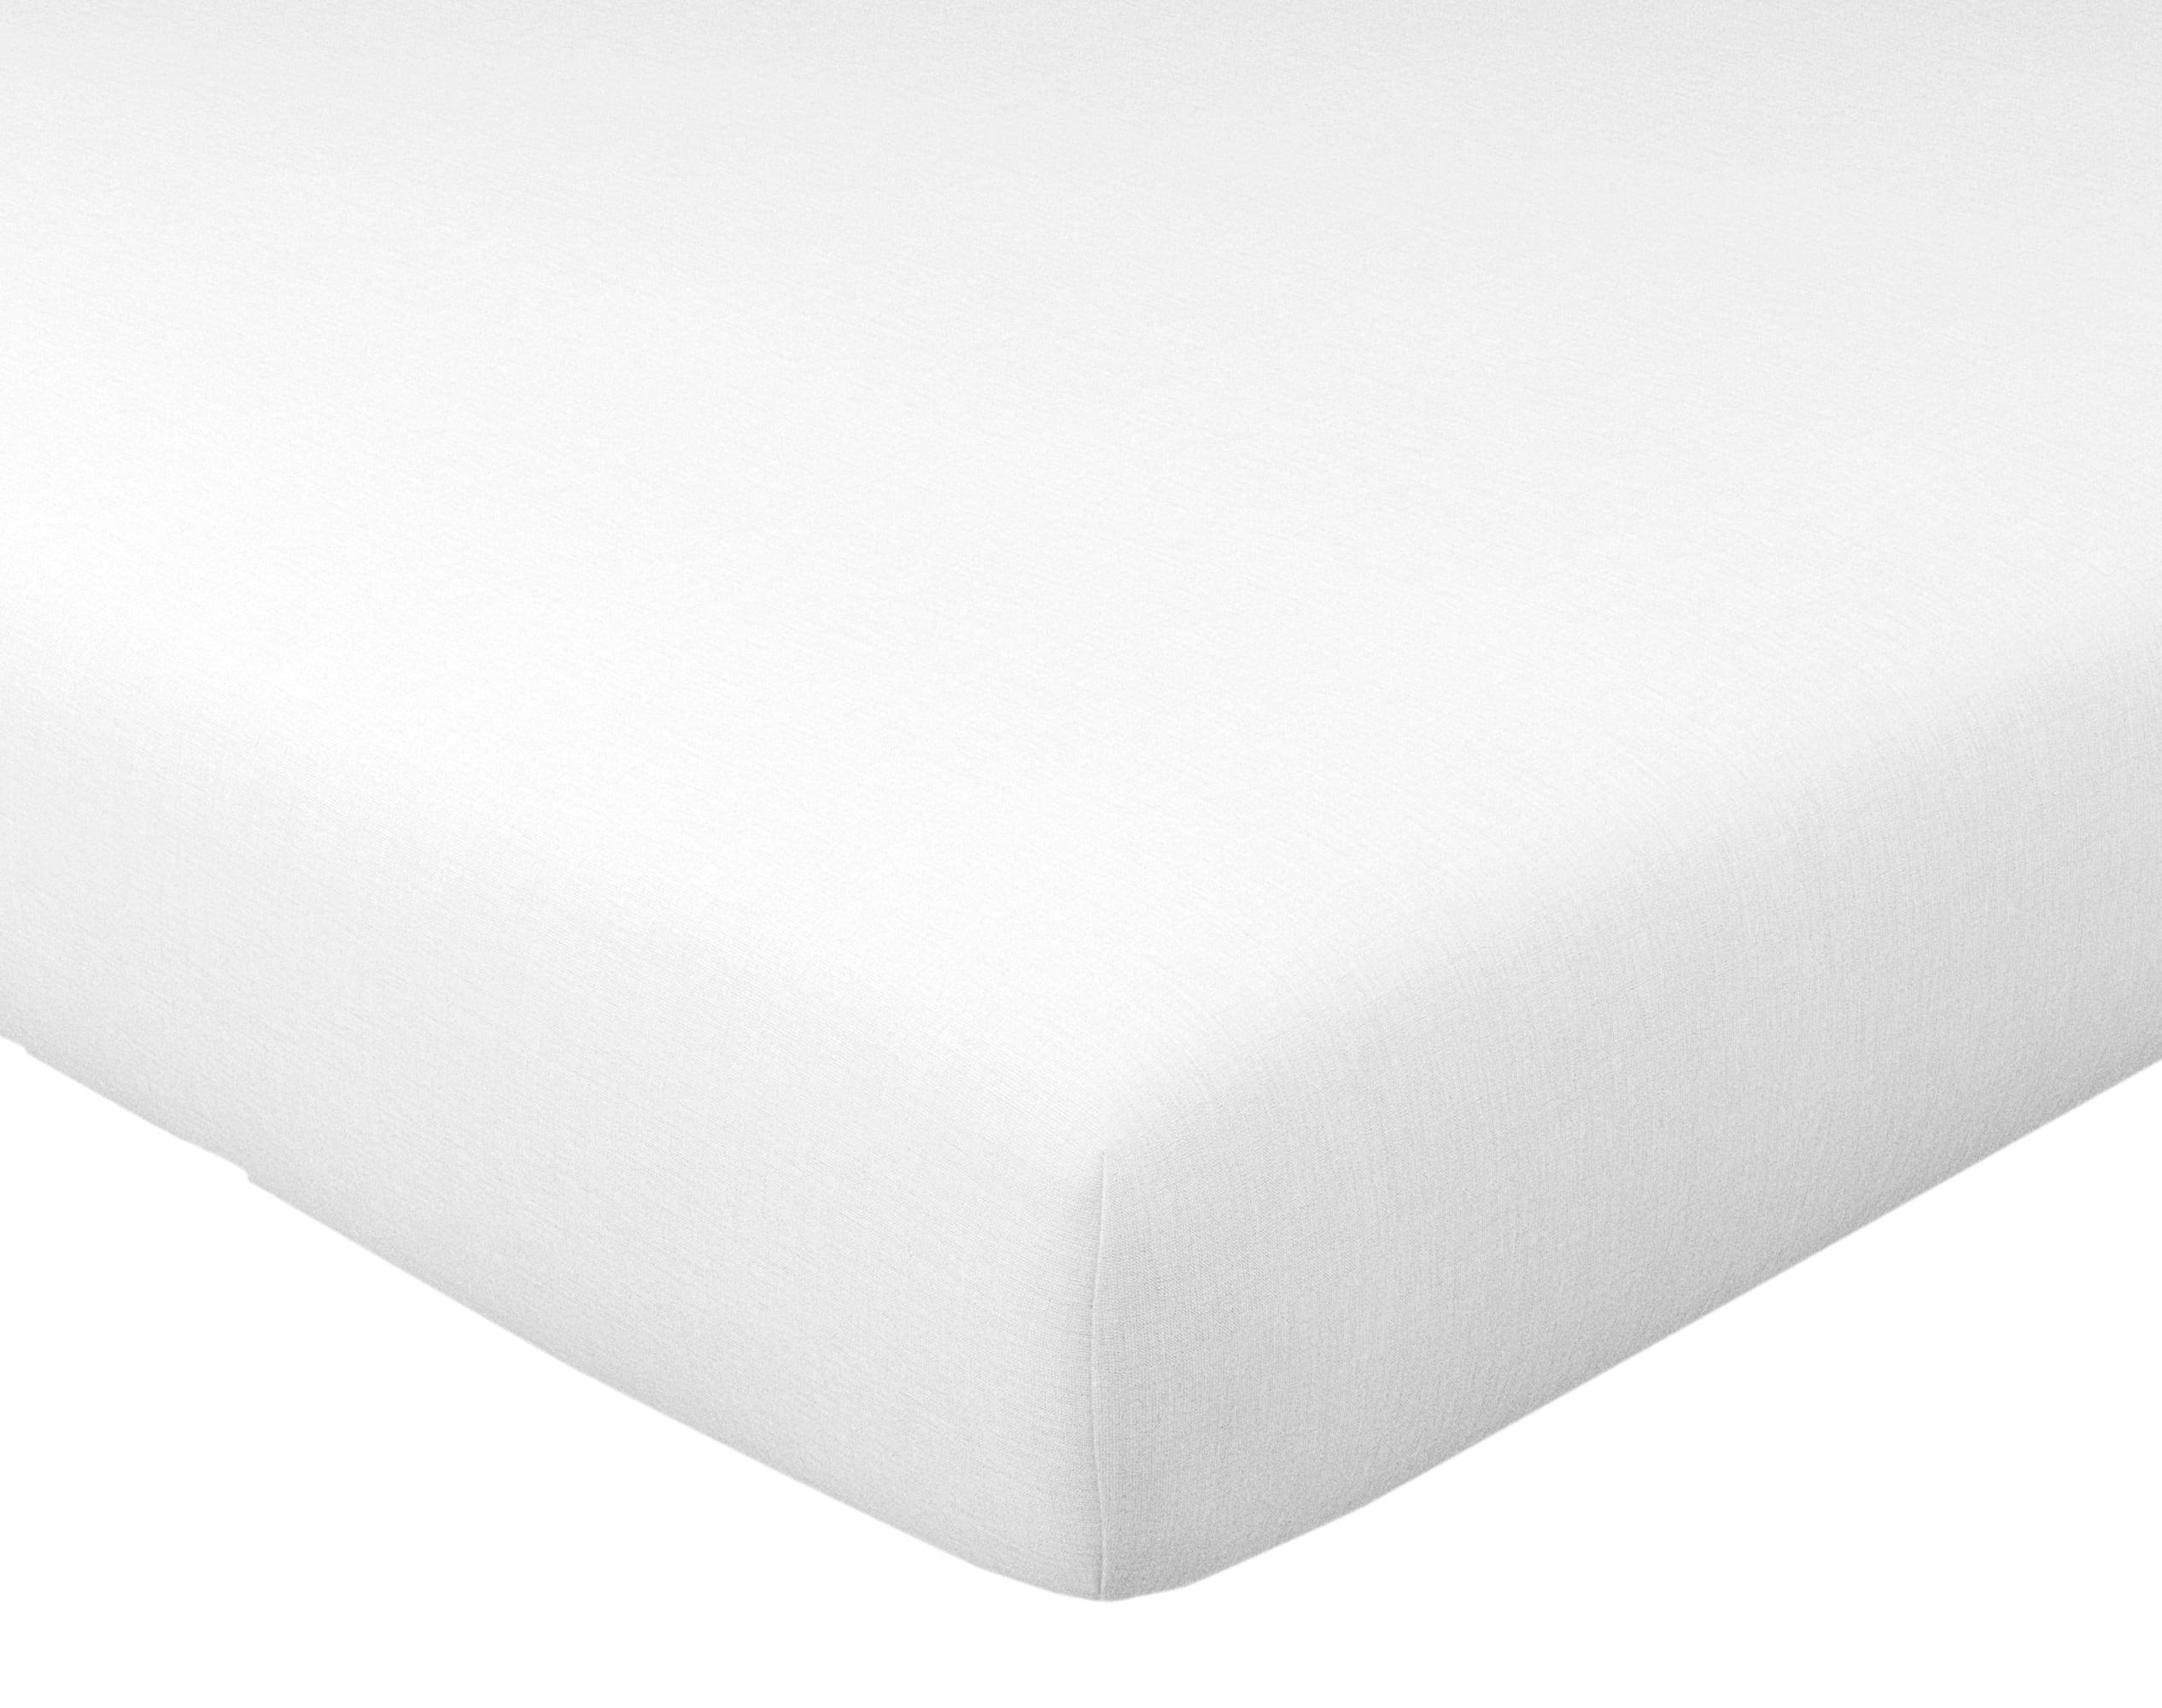 Drap-housse 180x200 en lin lavé blanc